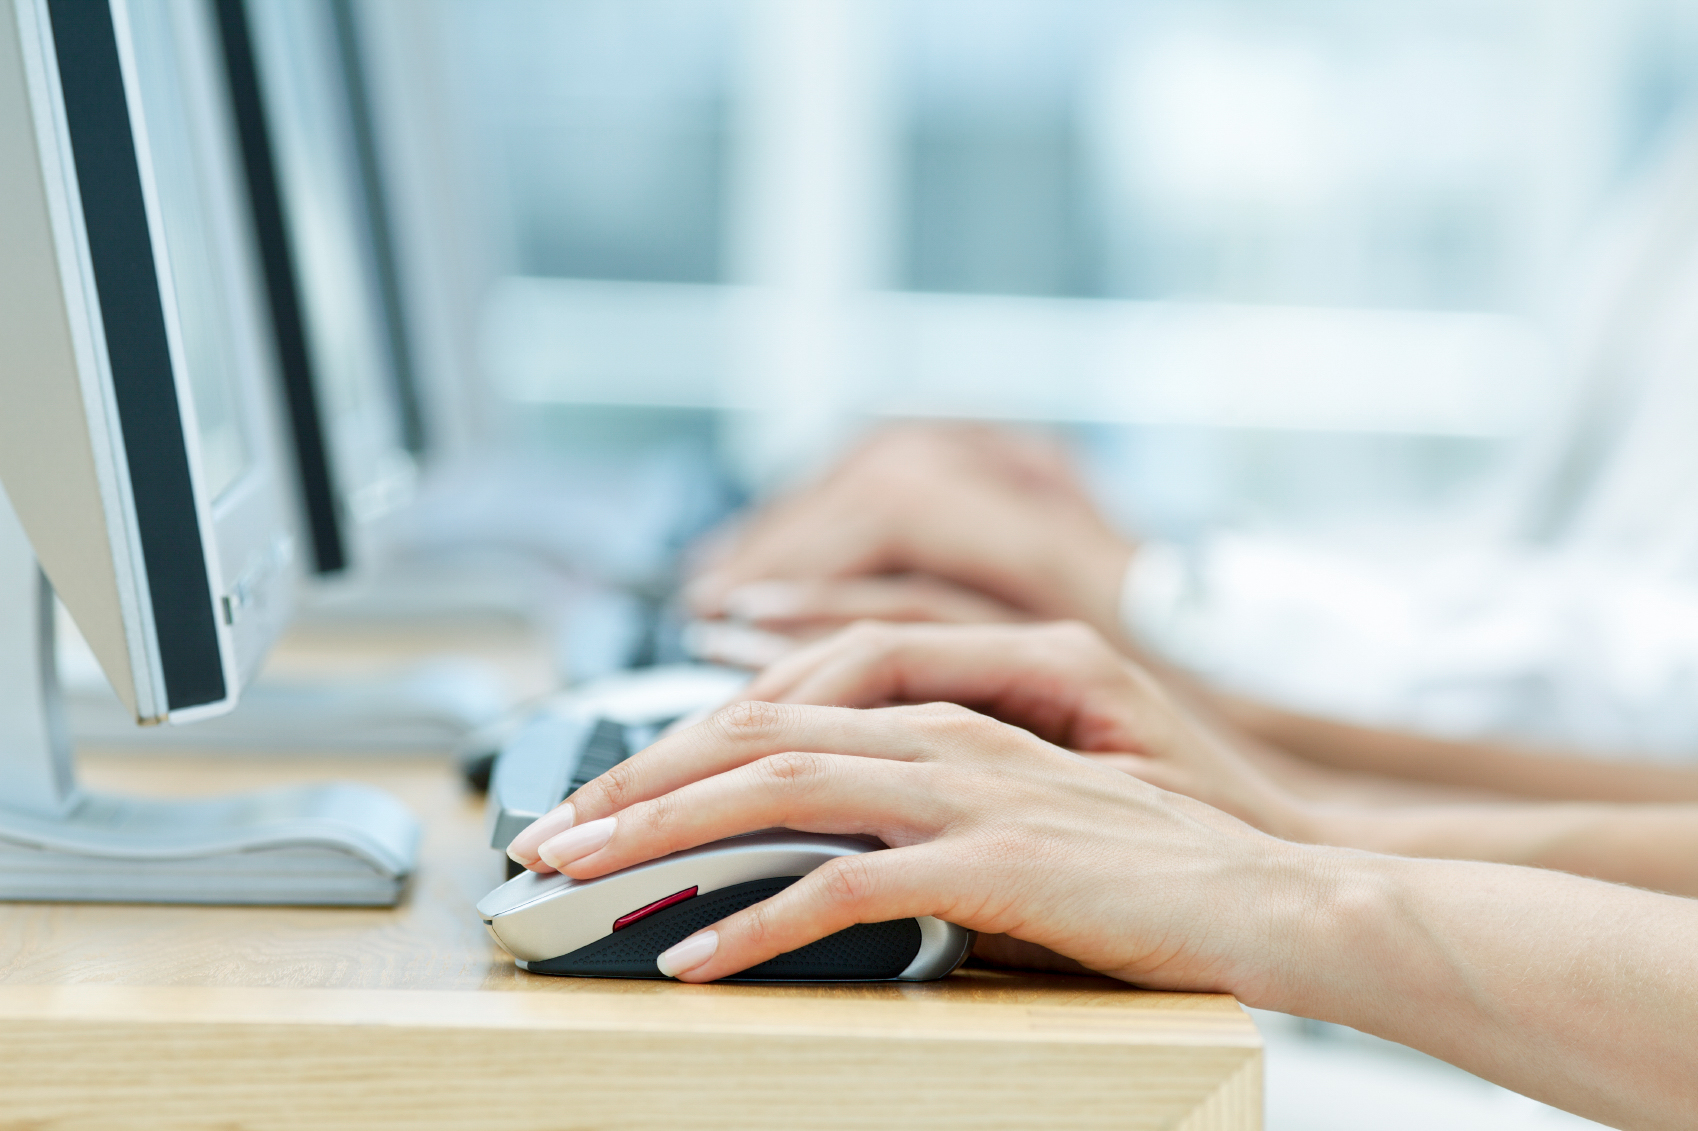 2_ergonomic-office-chair-study